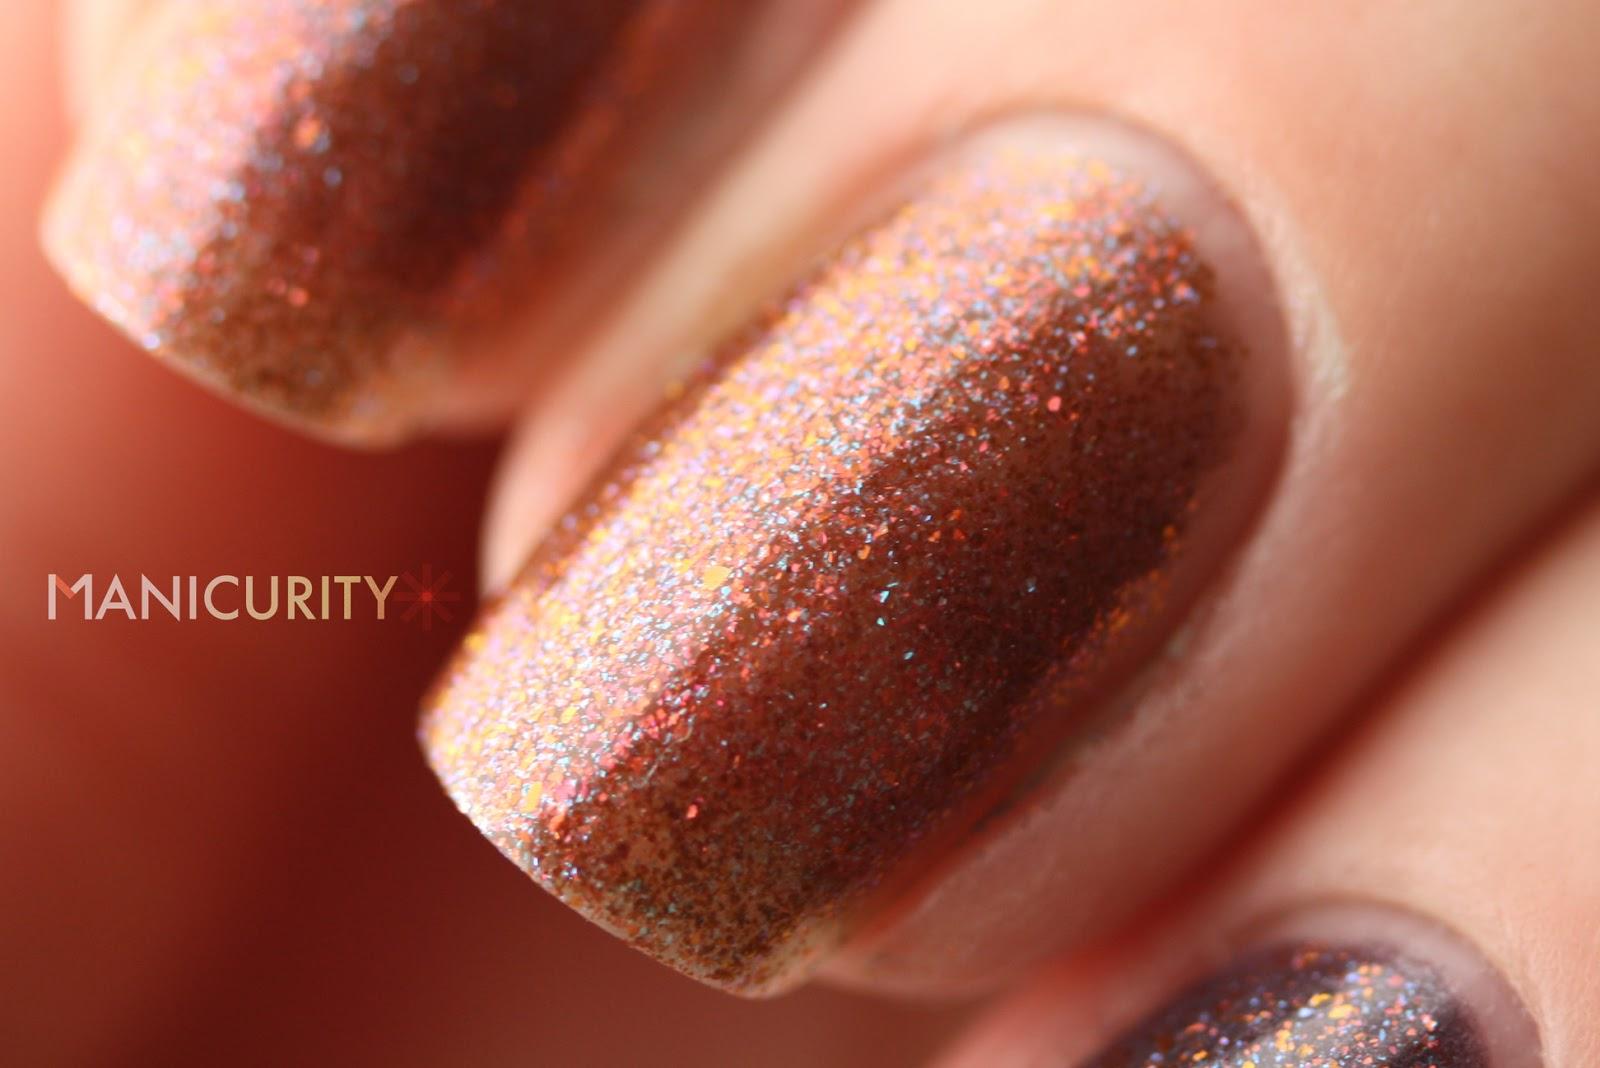 Manicurity January 2013